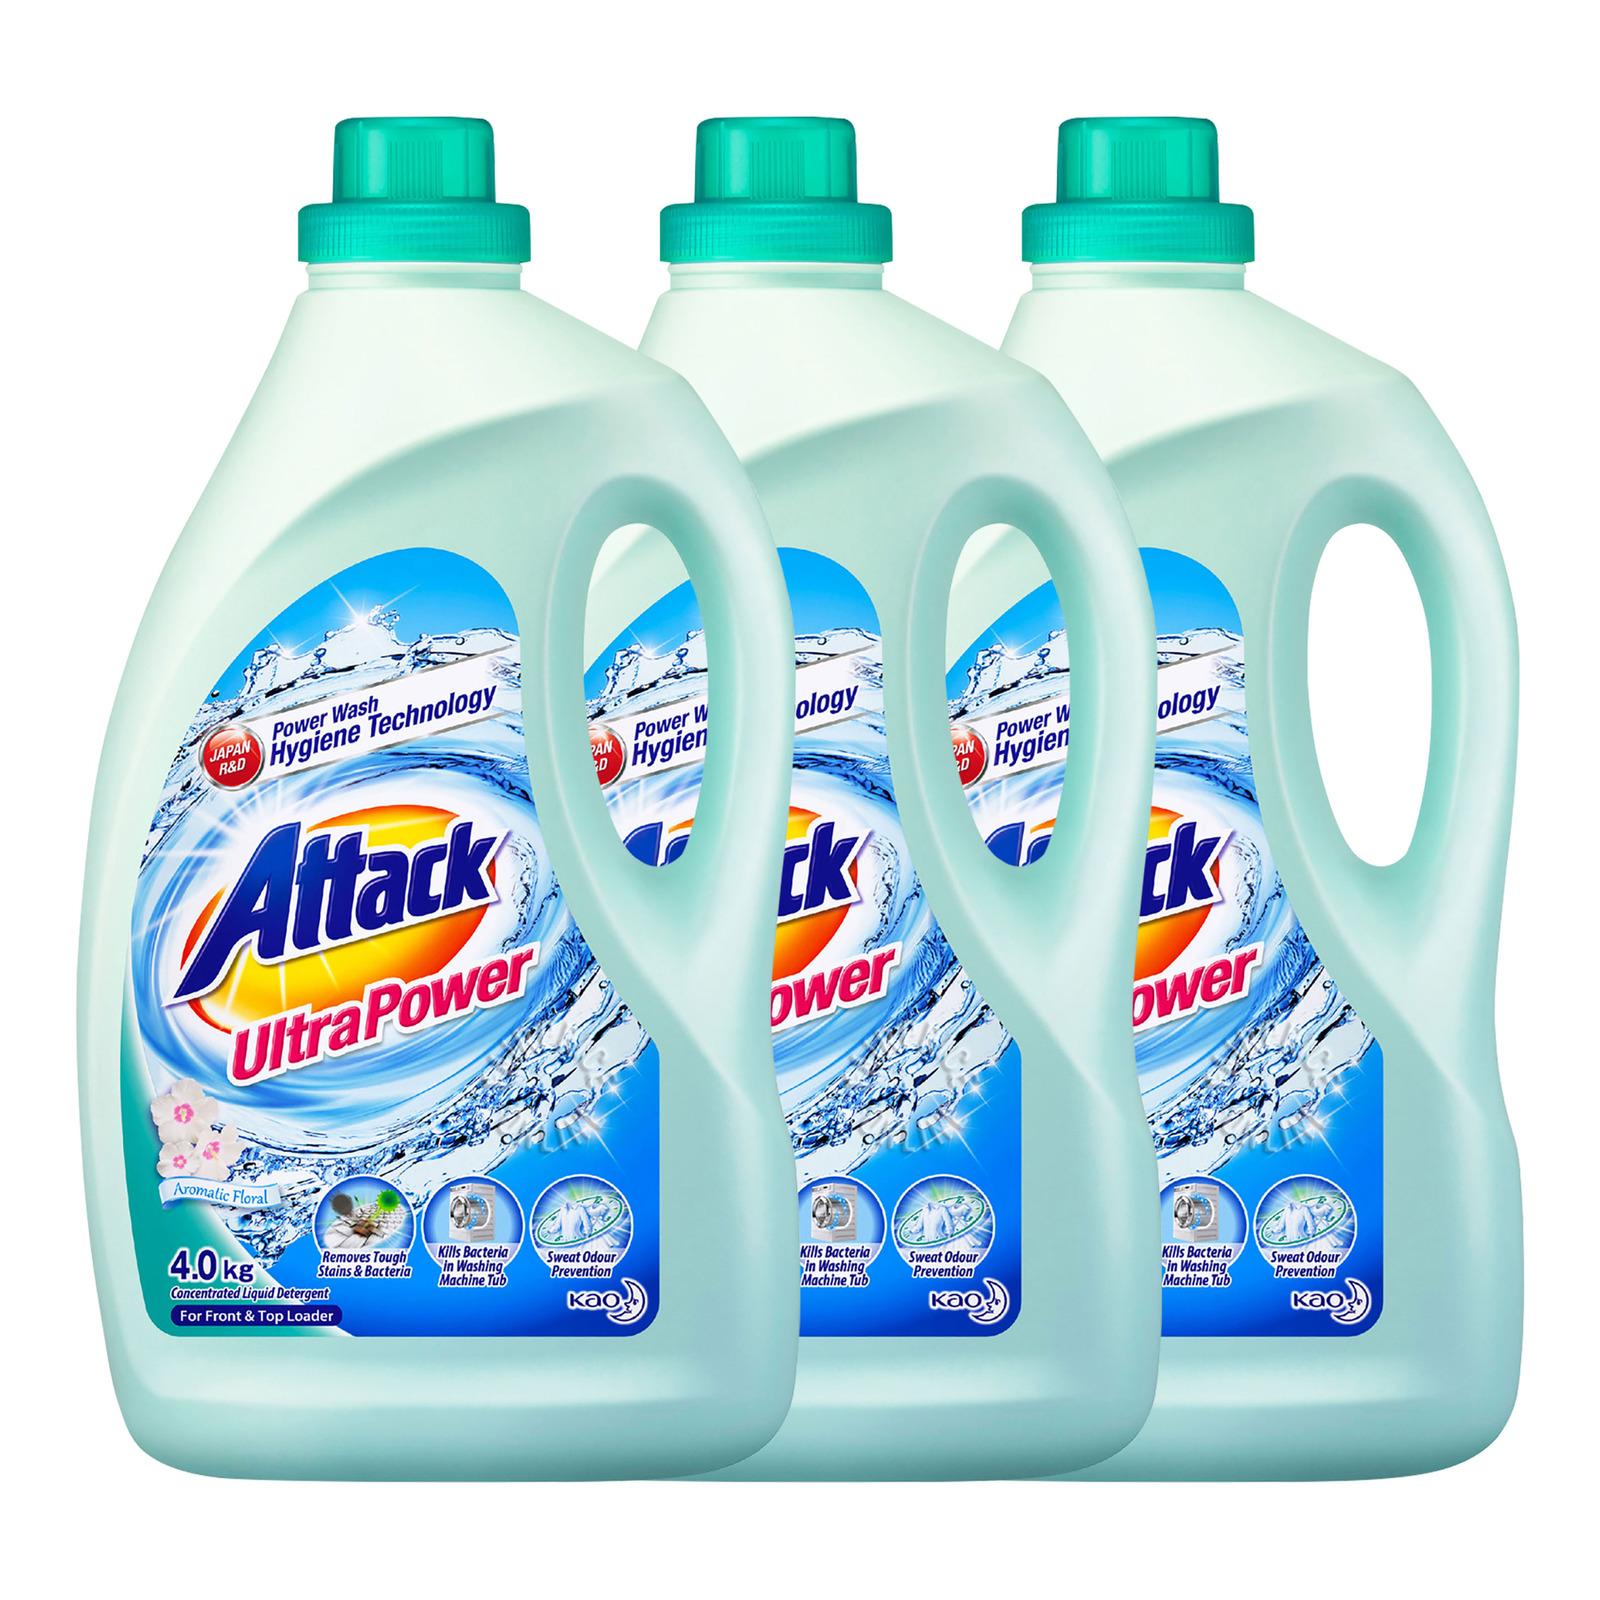 Attack Liquid Detergent - Ultra Power (Aromatic Floral)